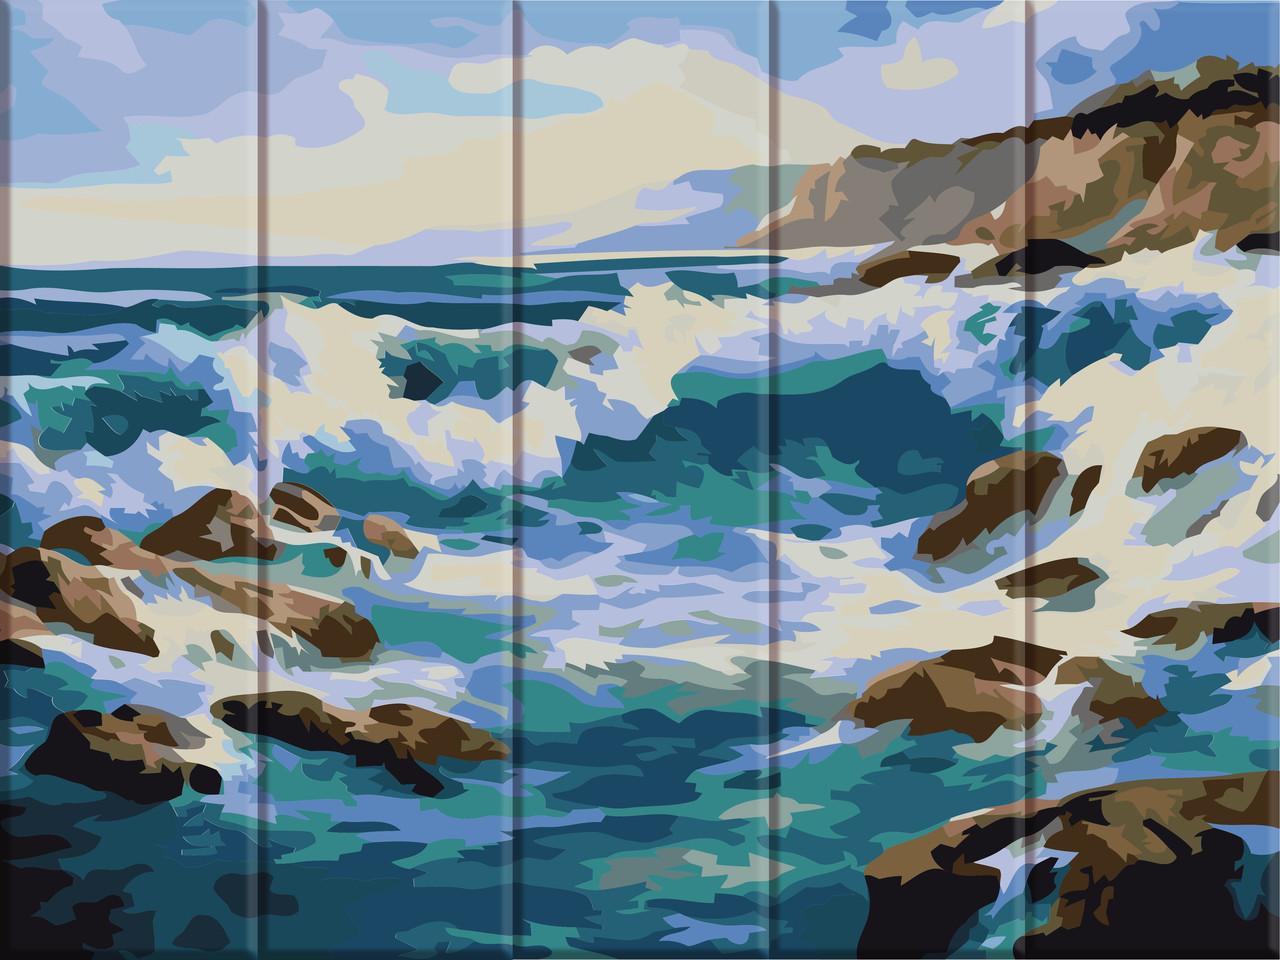 Картина-раскраска по номерам на дереве Прибой ArtStory ASW068 30 х 40 см